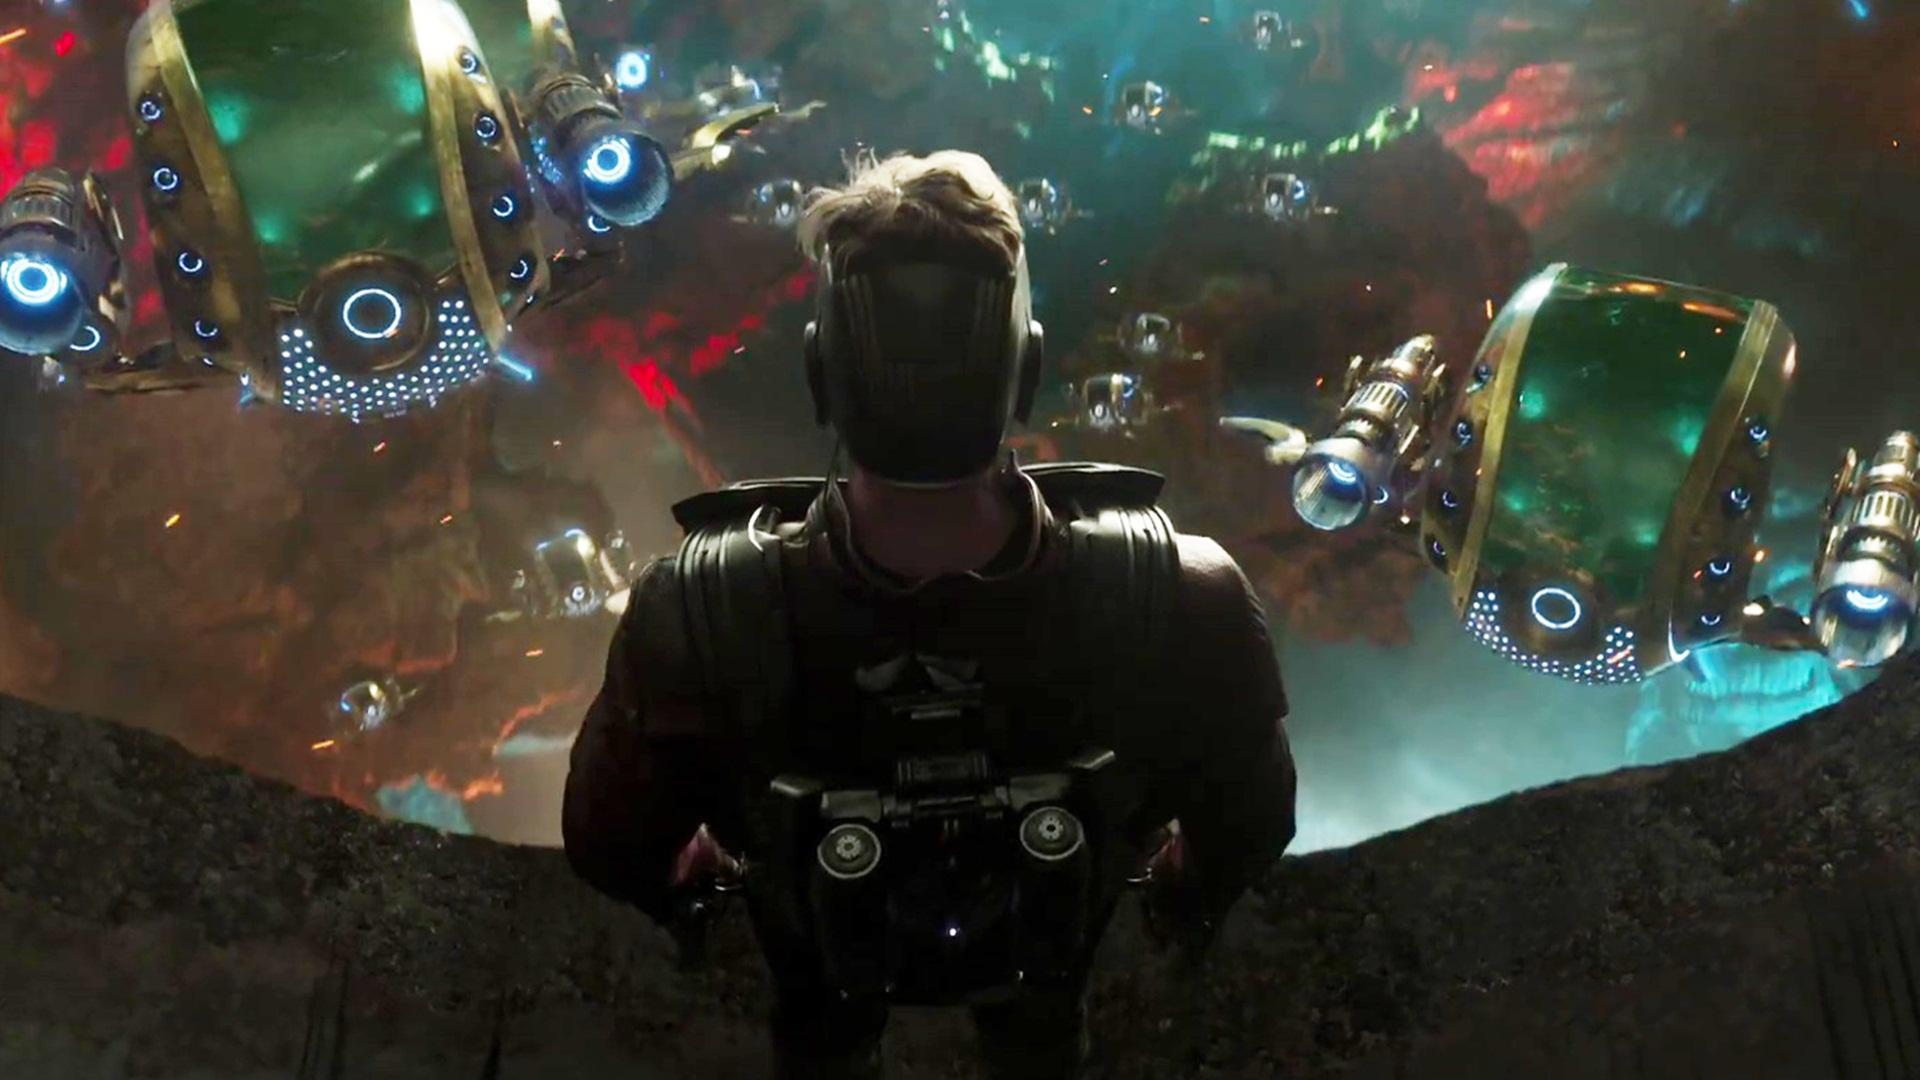 Guardians Of The Galaxy Vol 2 Chris Pratt As Star Lord 1920x1080